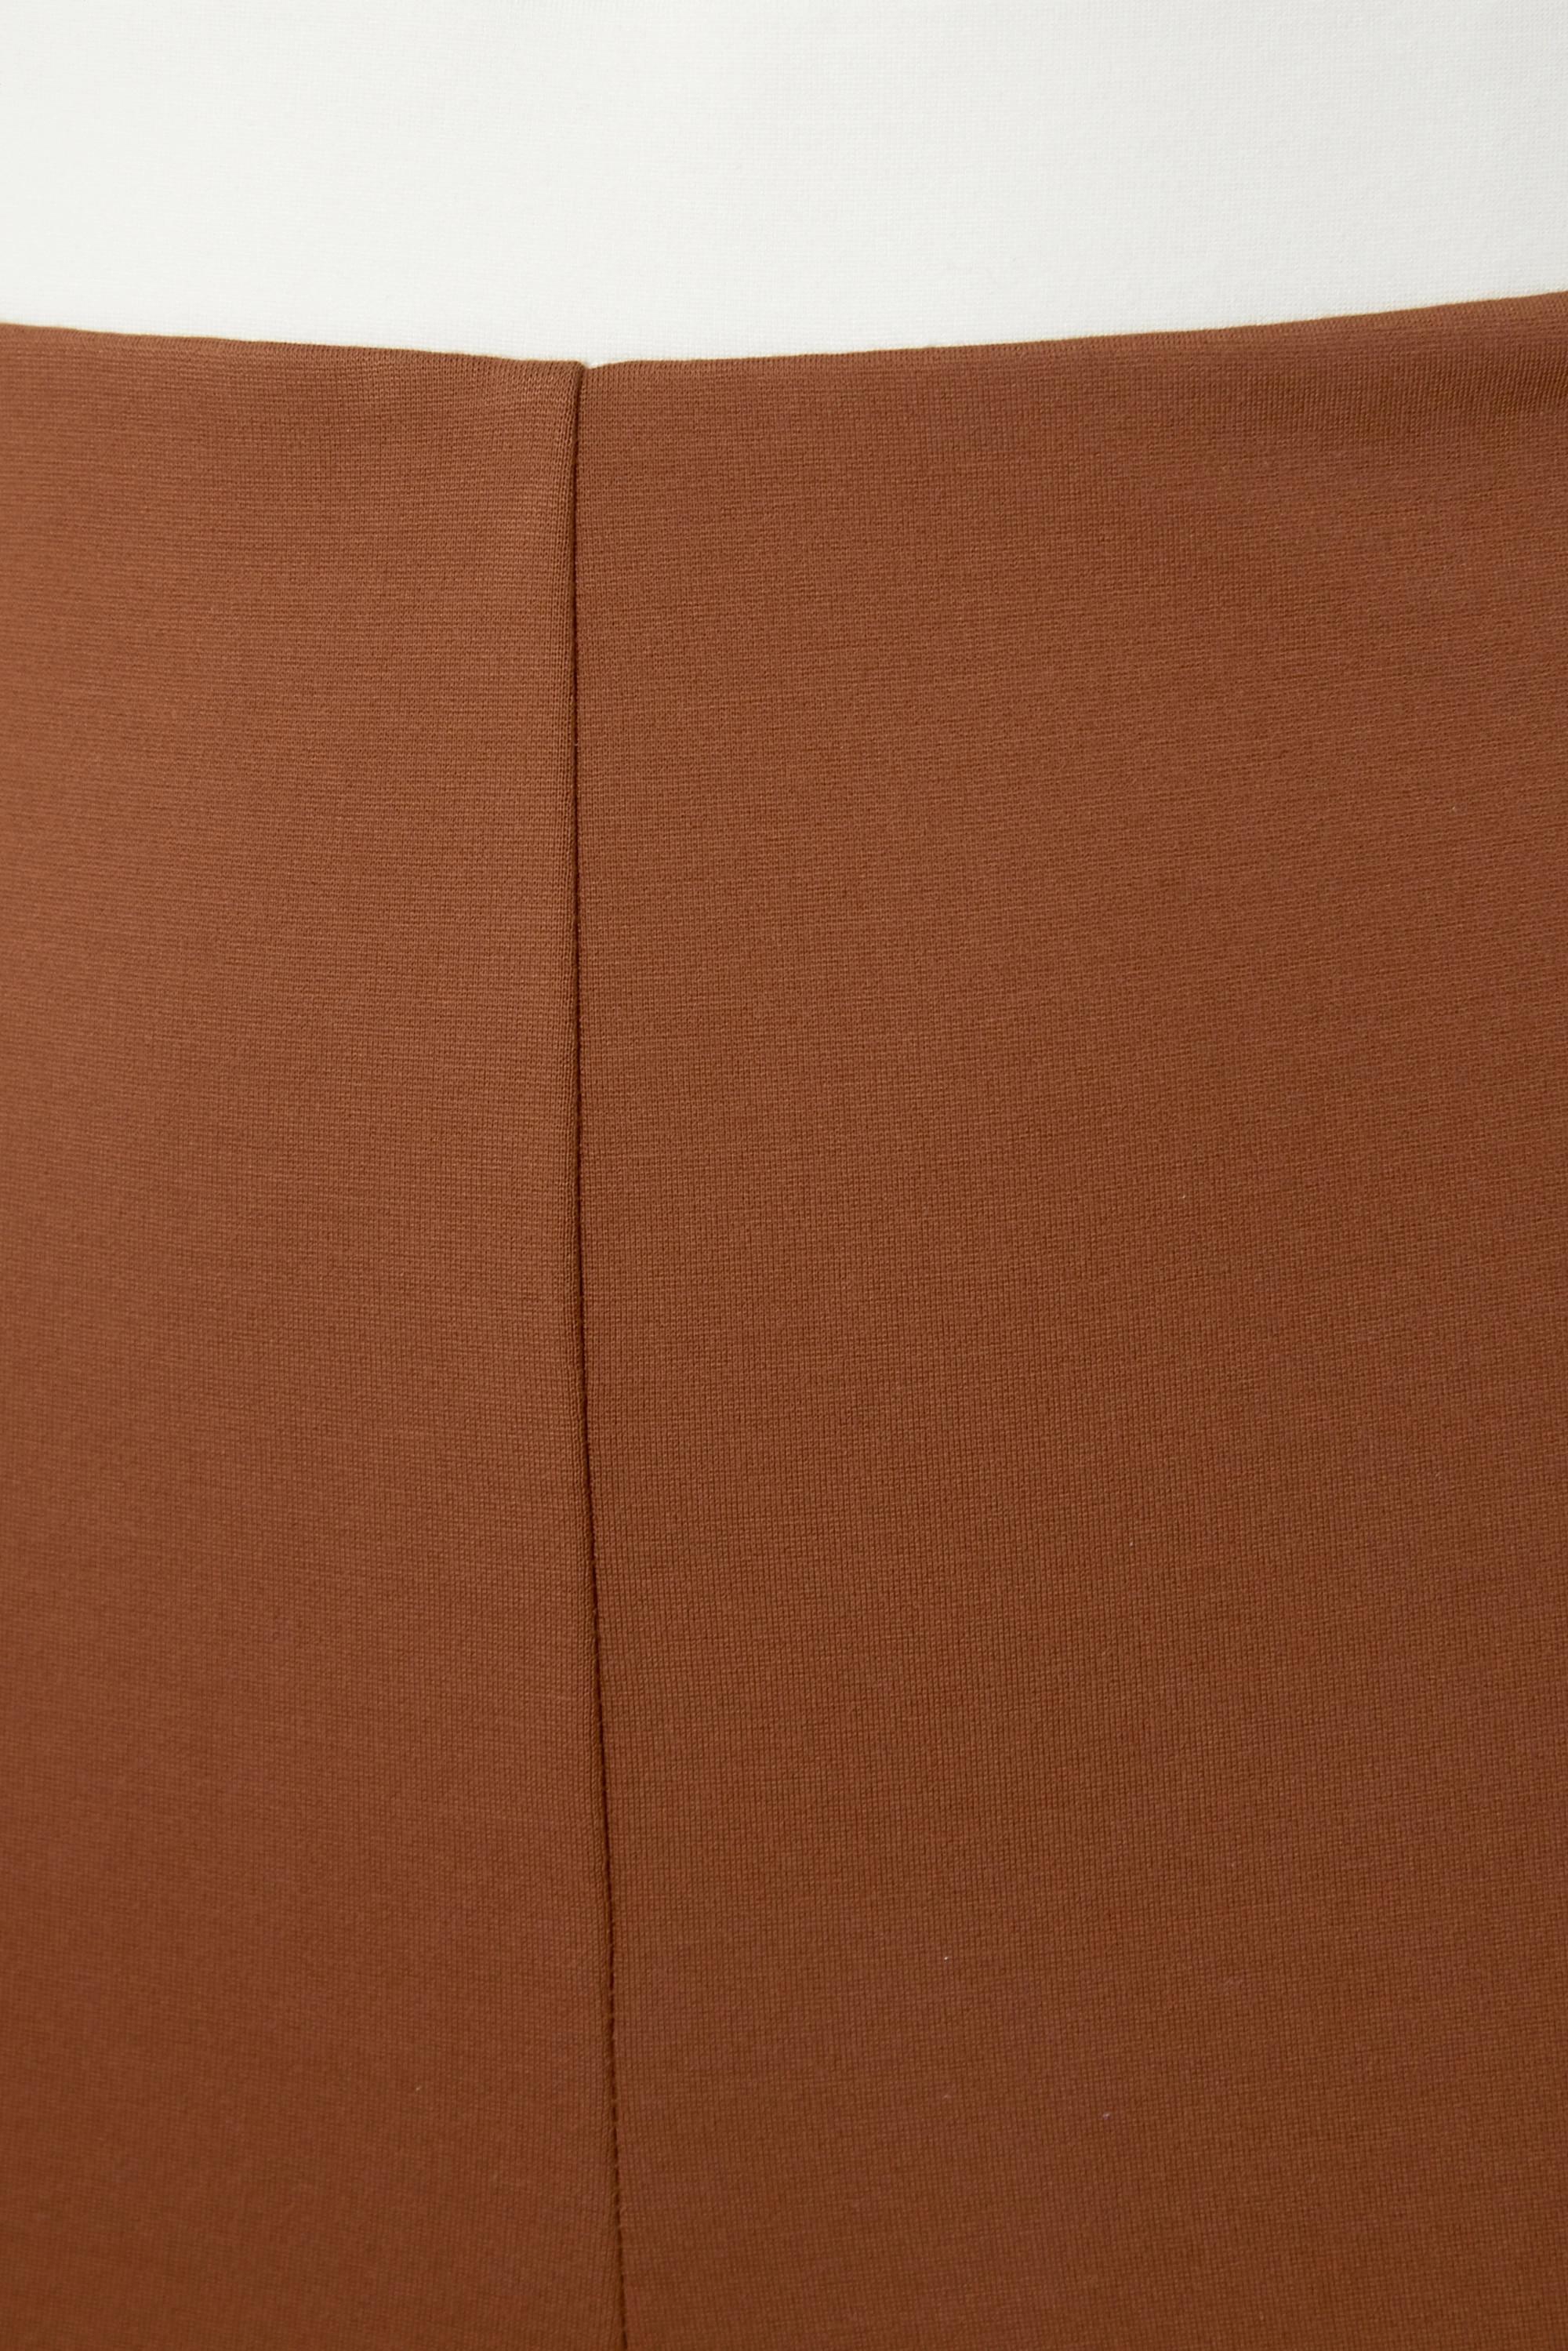 STAUD Milo striped stretch-ponte flared pants